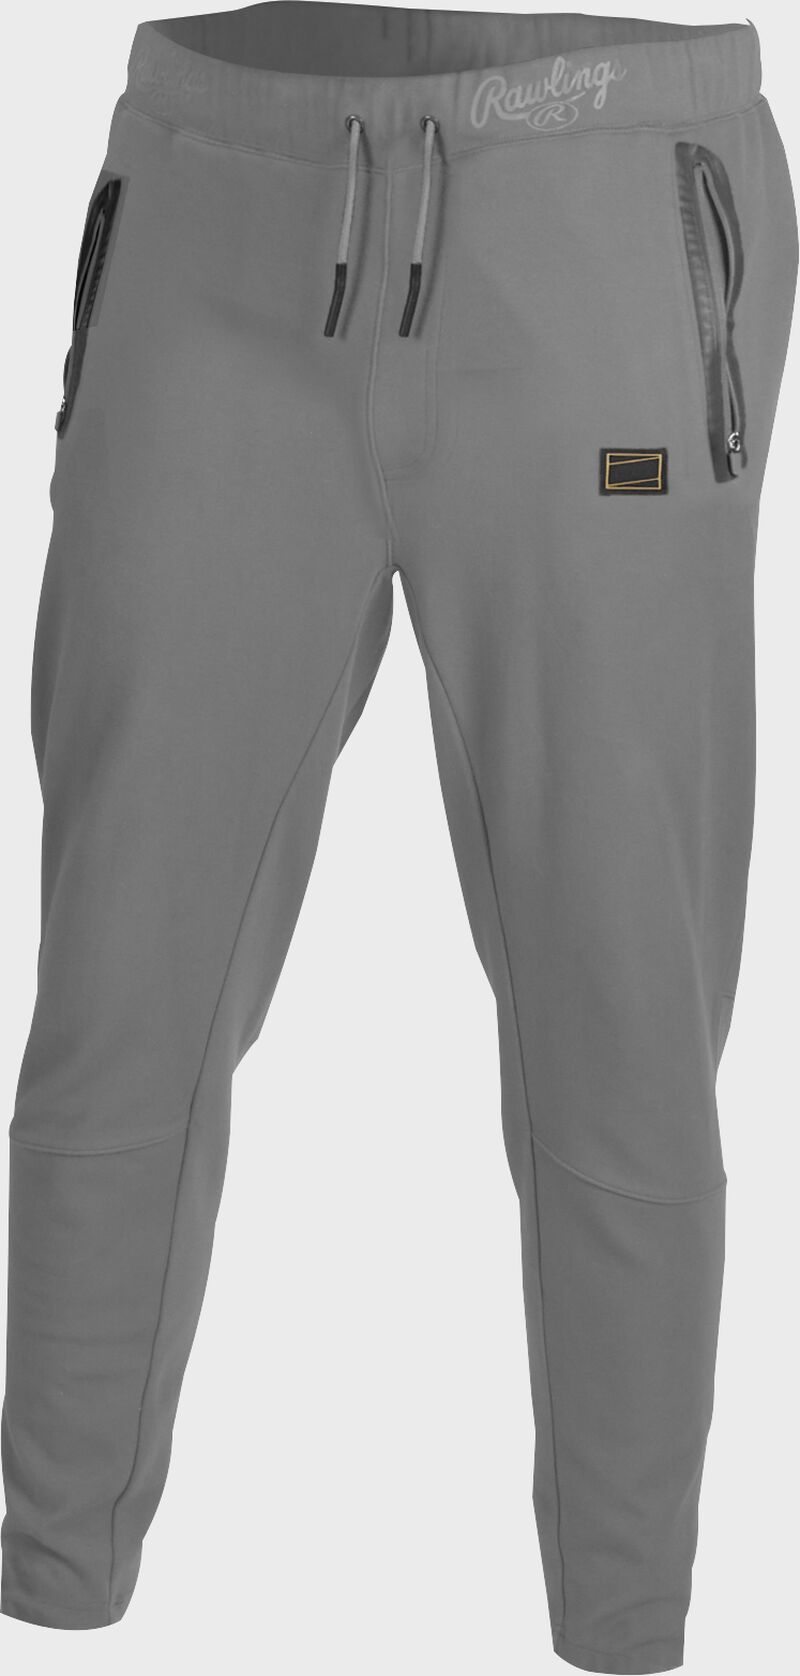 Gray Gold Collection jogger style pants with gray draw strings - SKU: GCJOG-BG